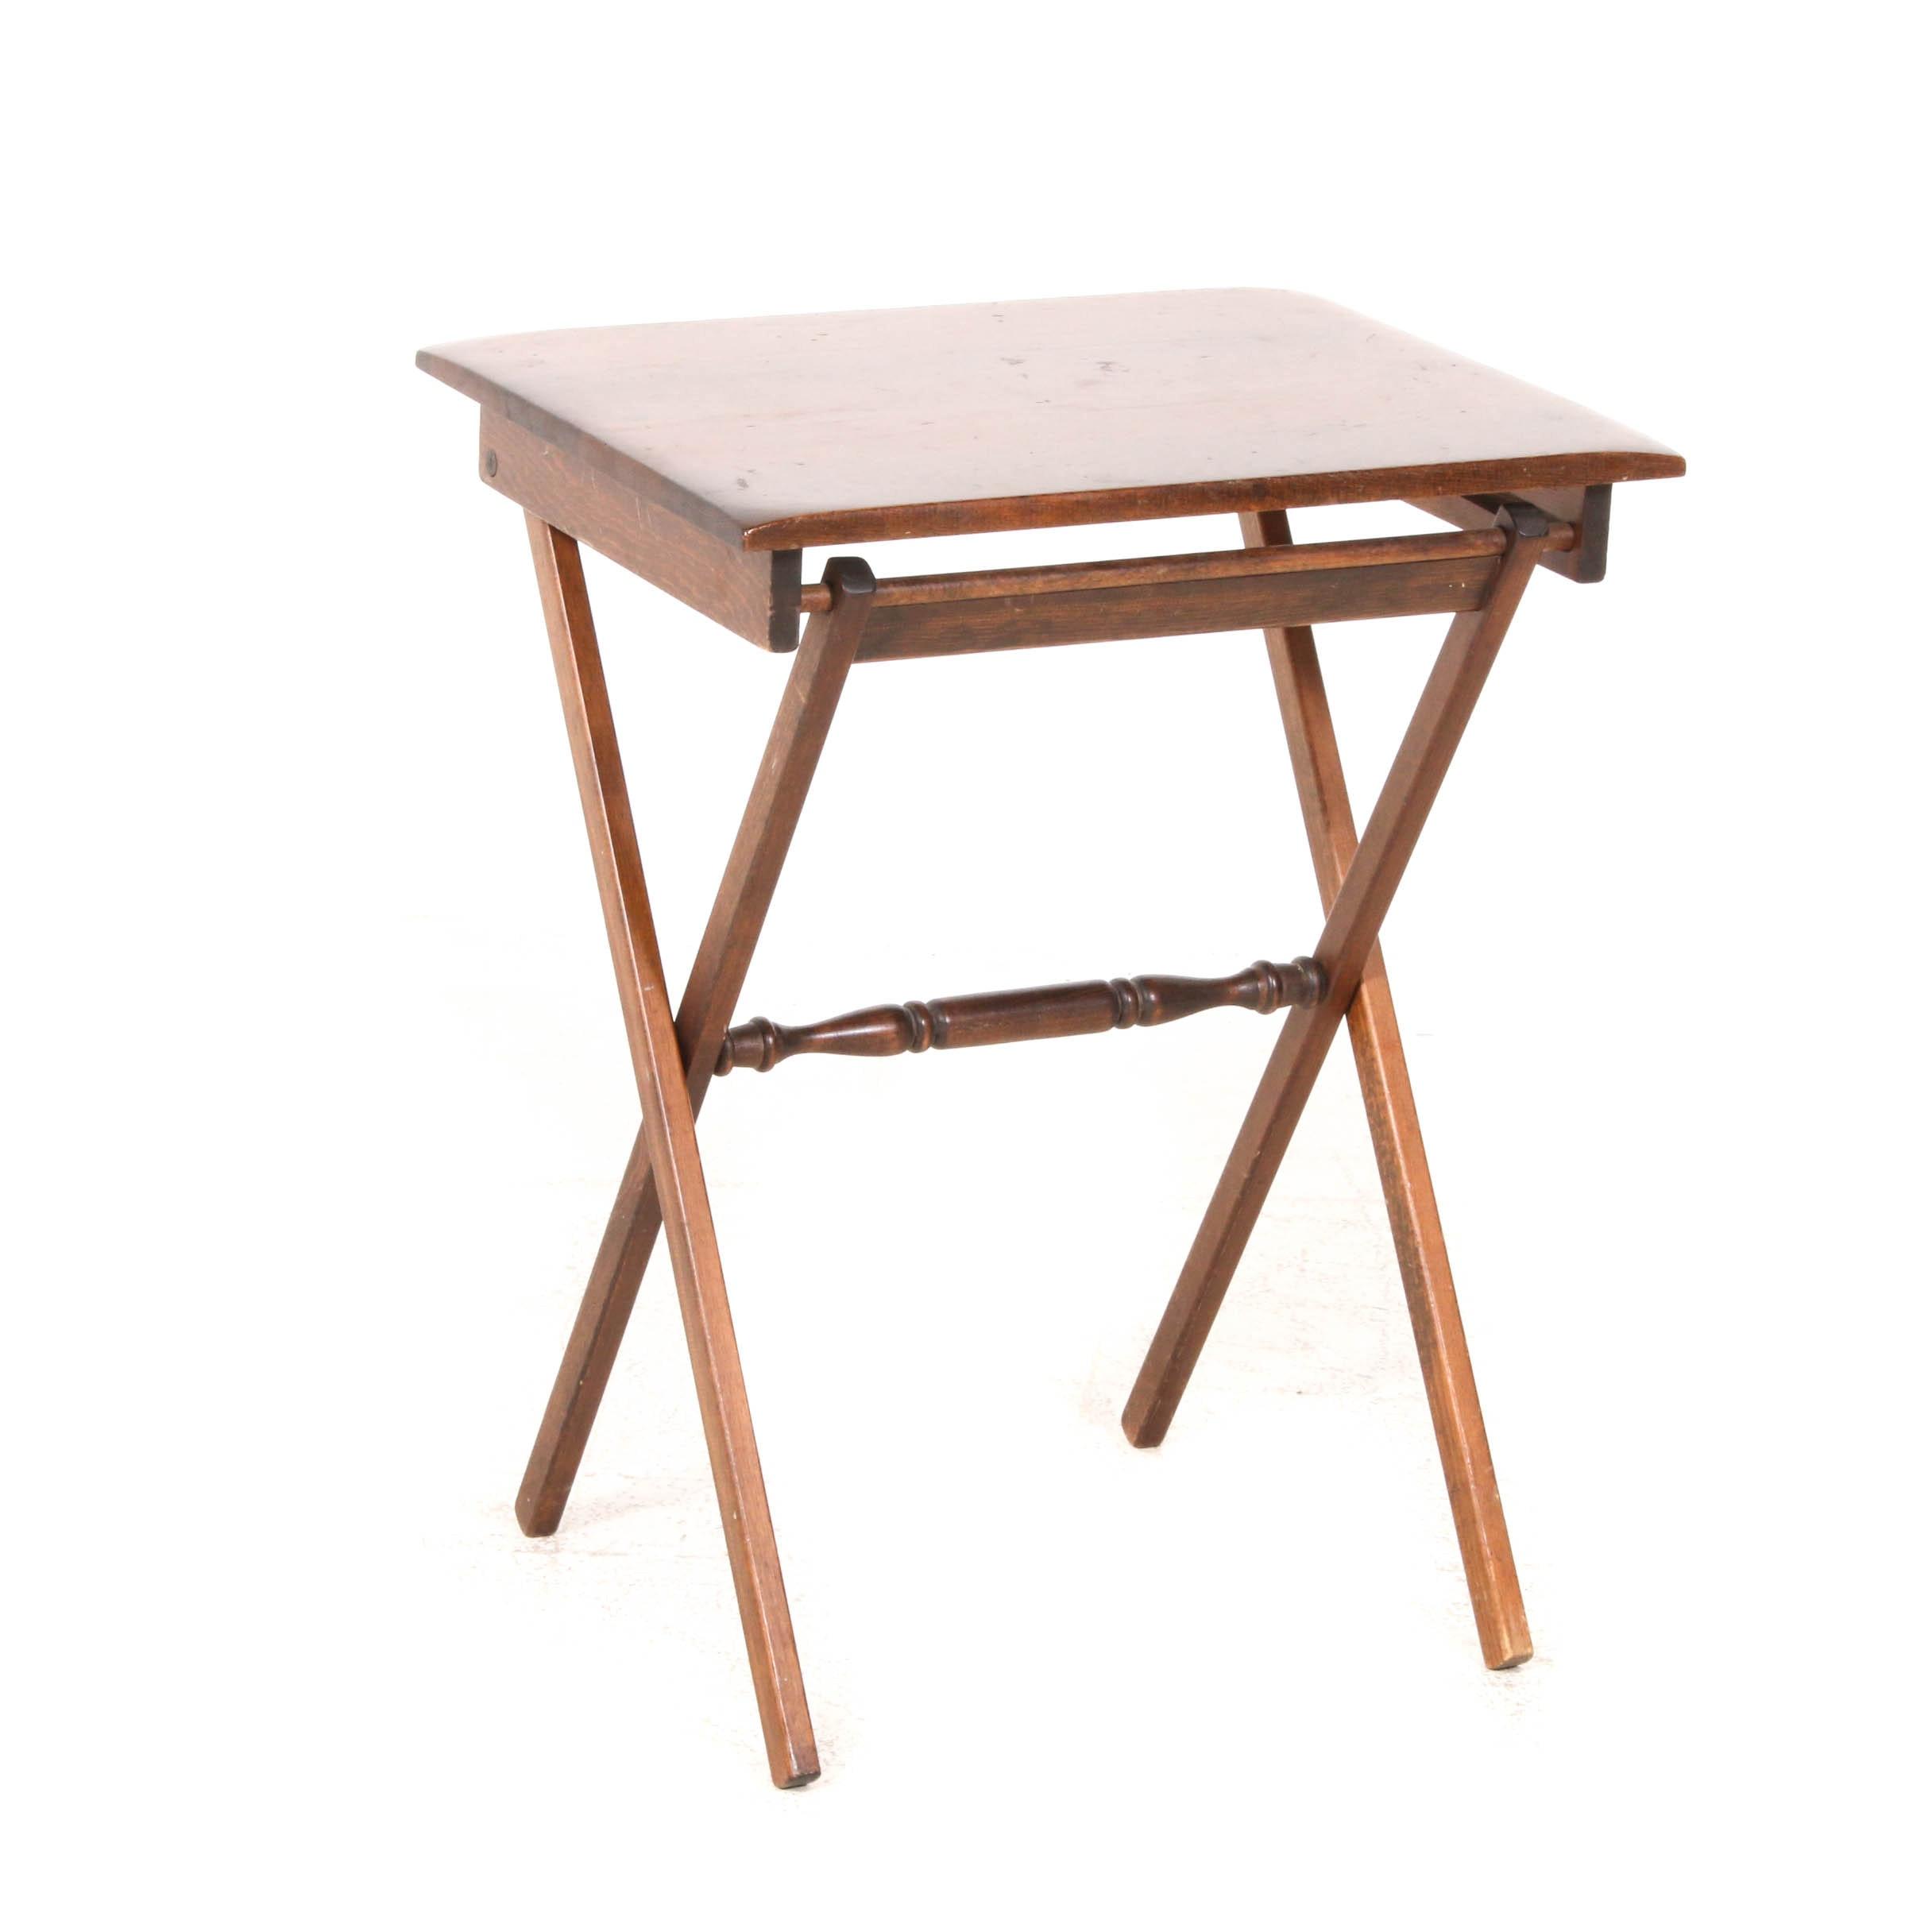 Wood Tilt-Top Table, Mid 20th Century